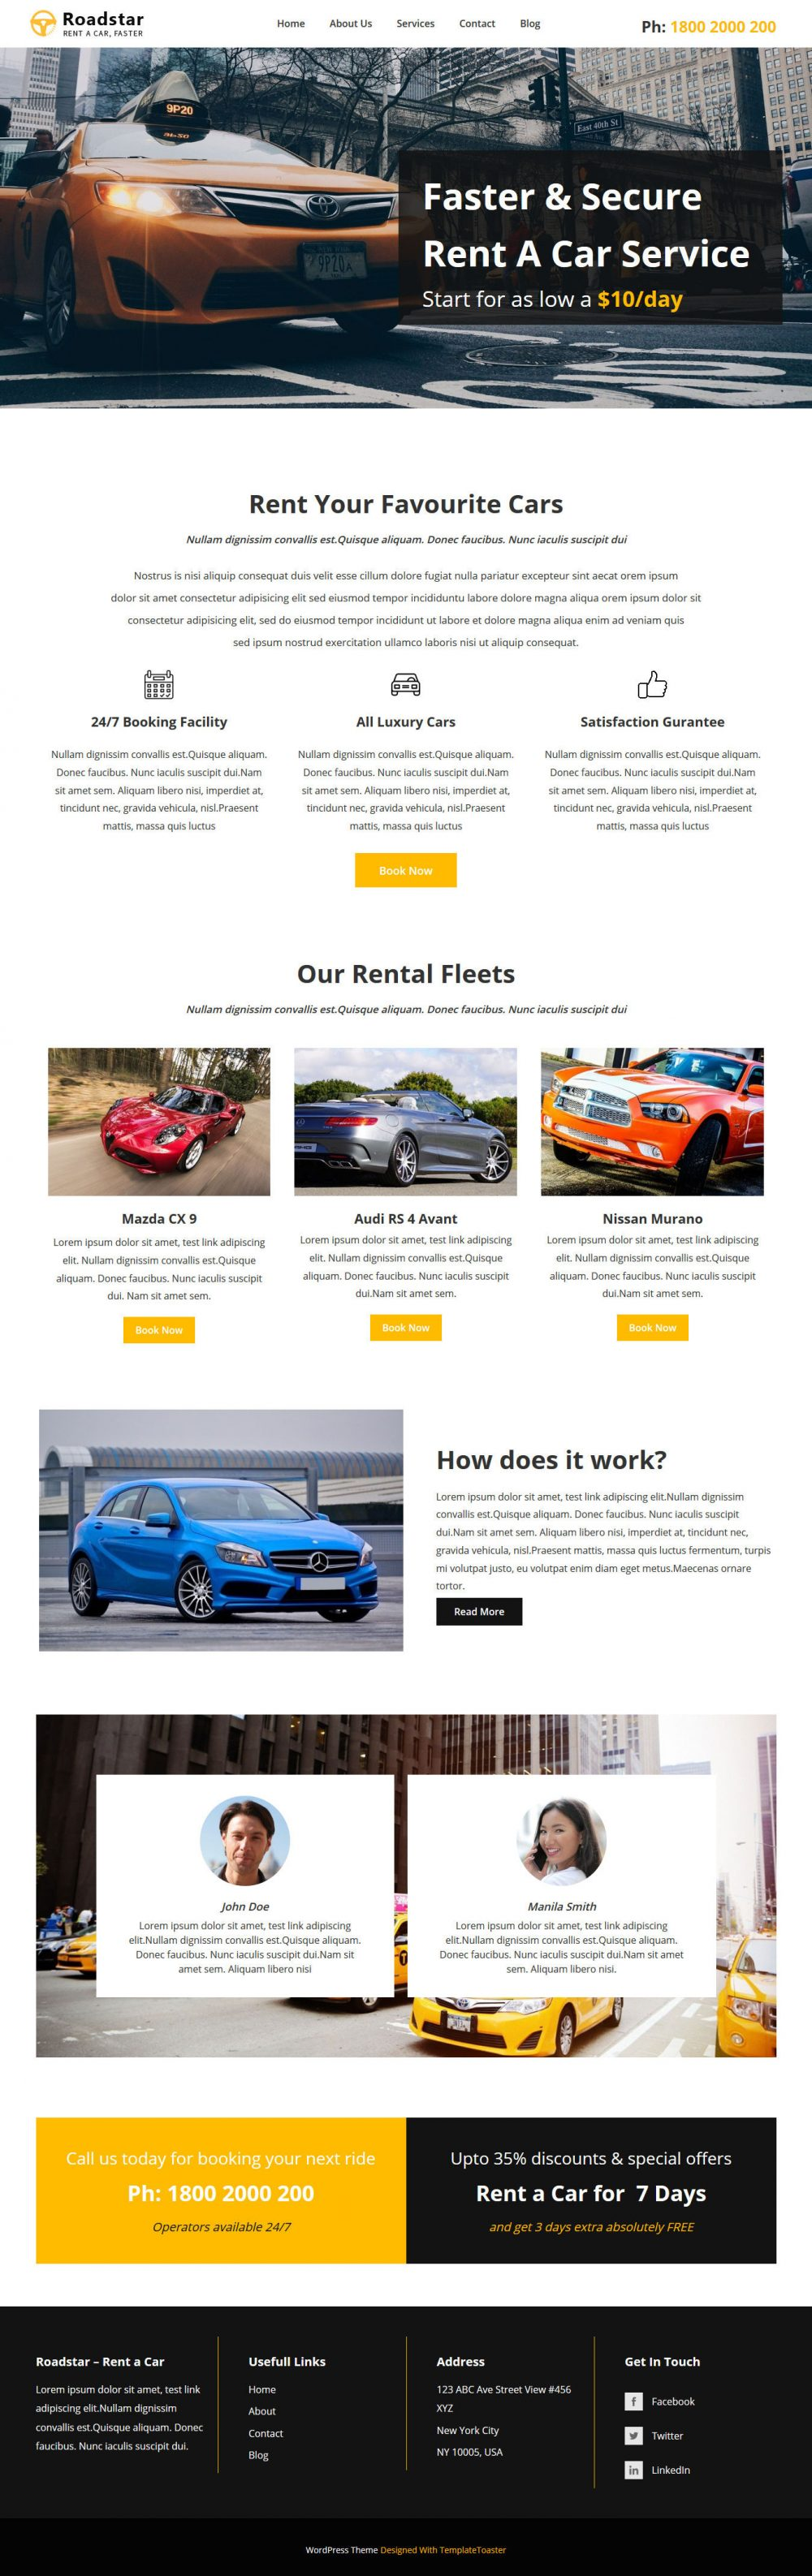 roadstar car rental services drupal theme